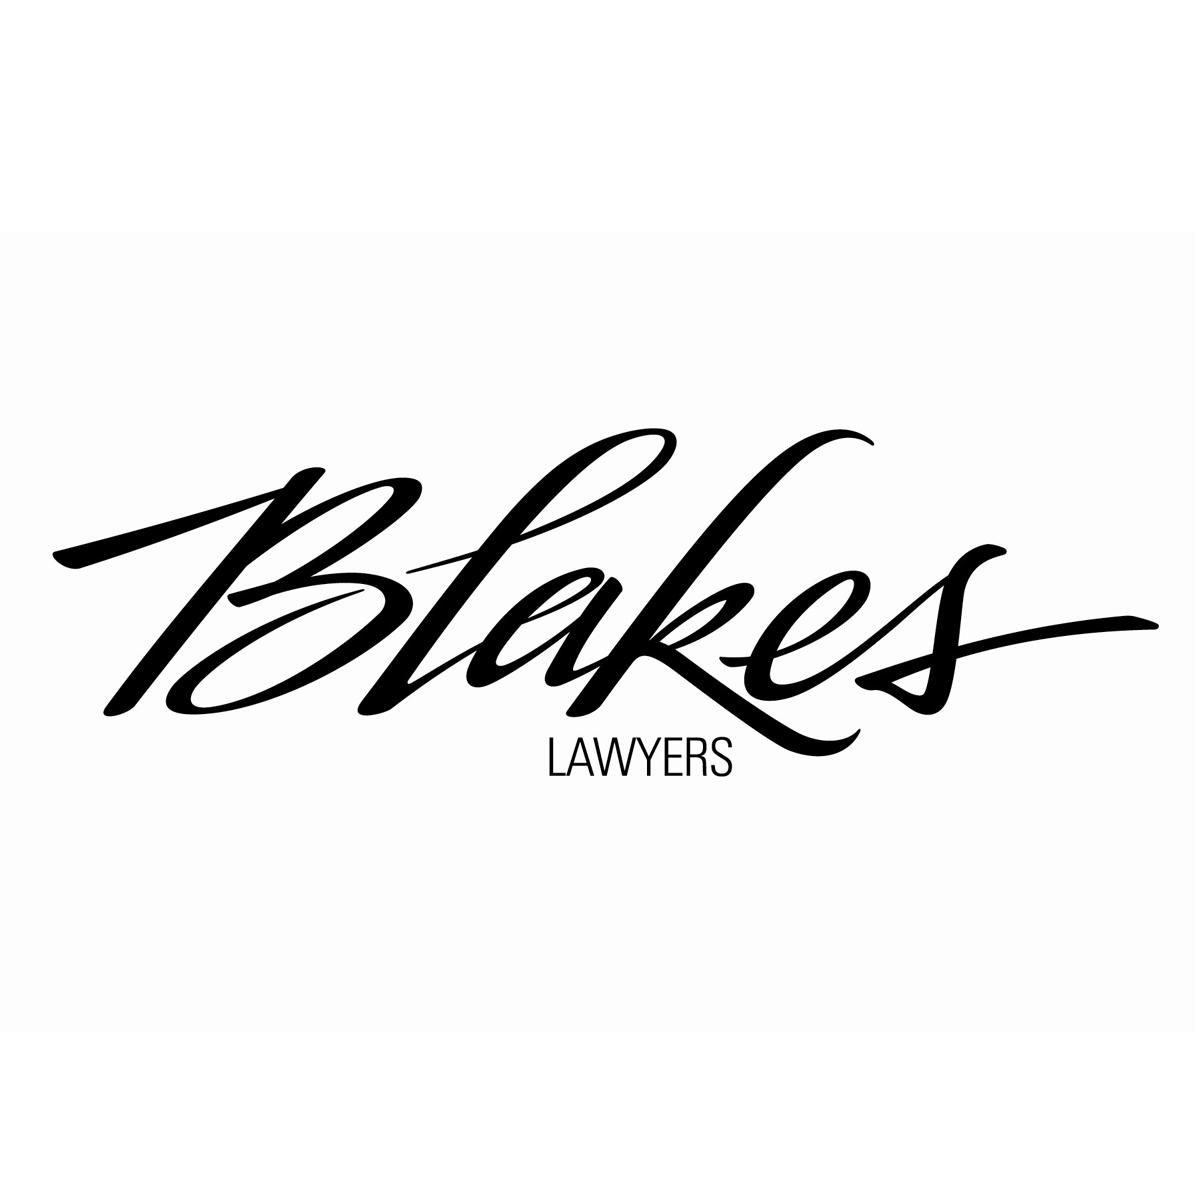 blakes.jpg